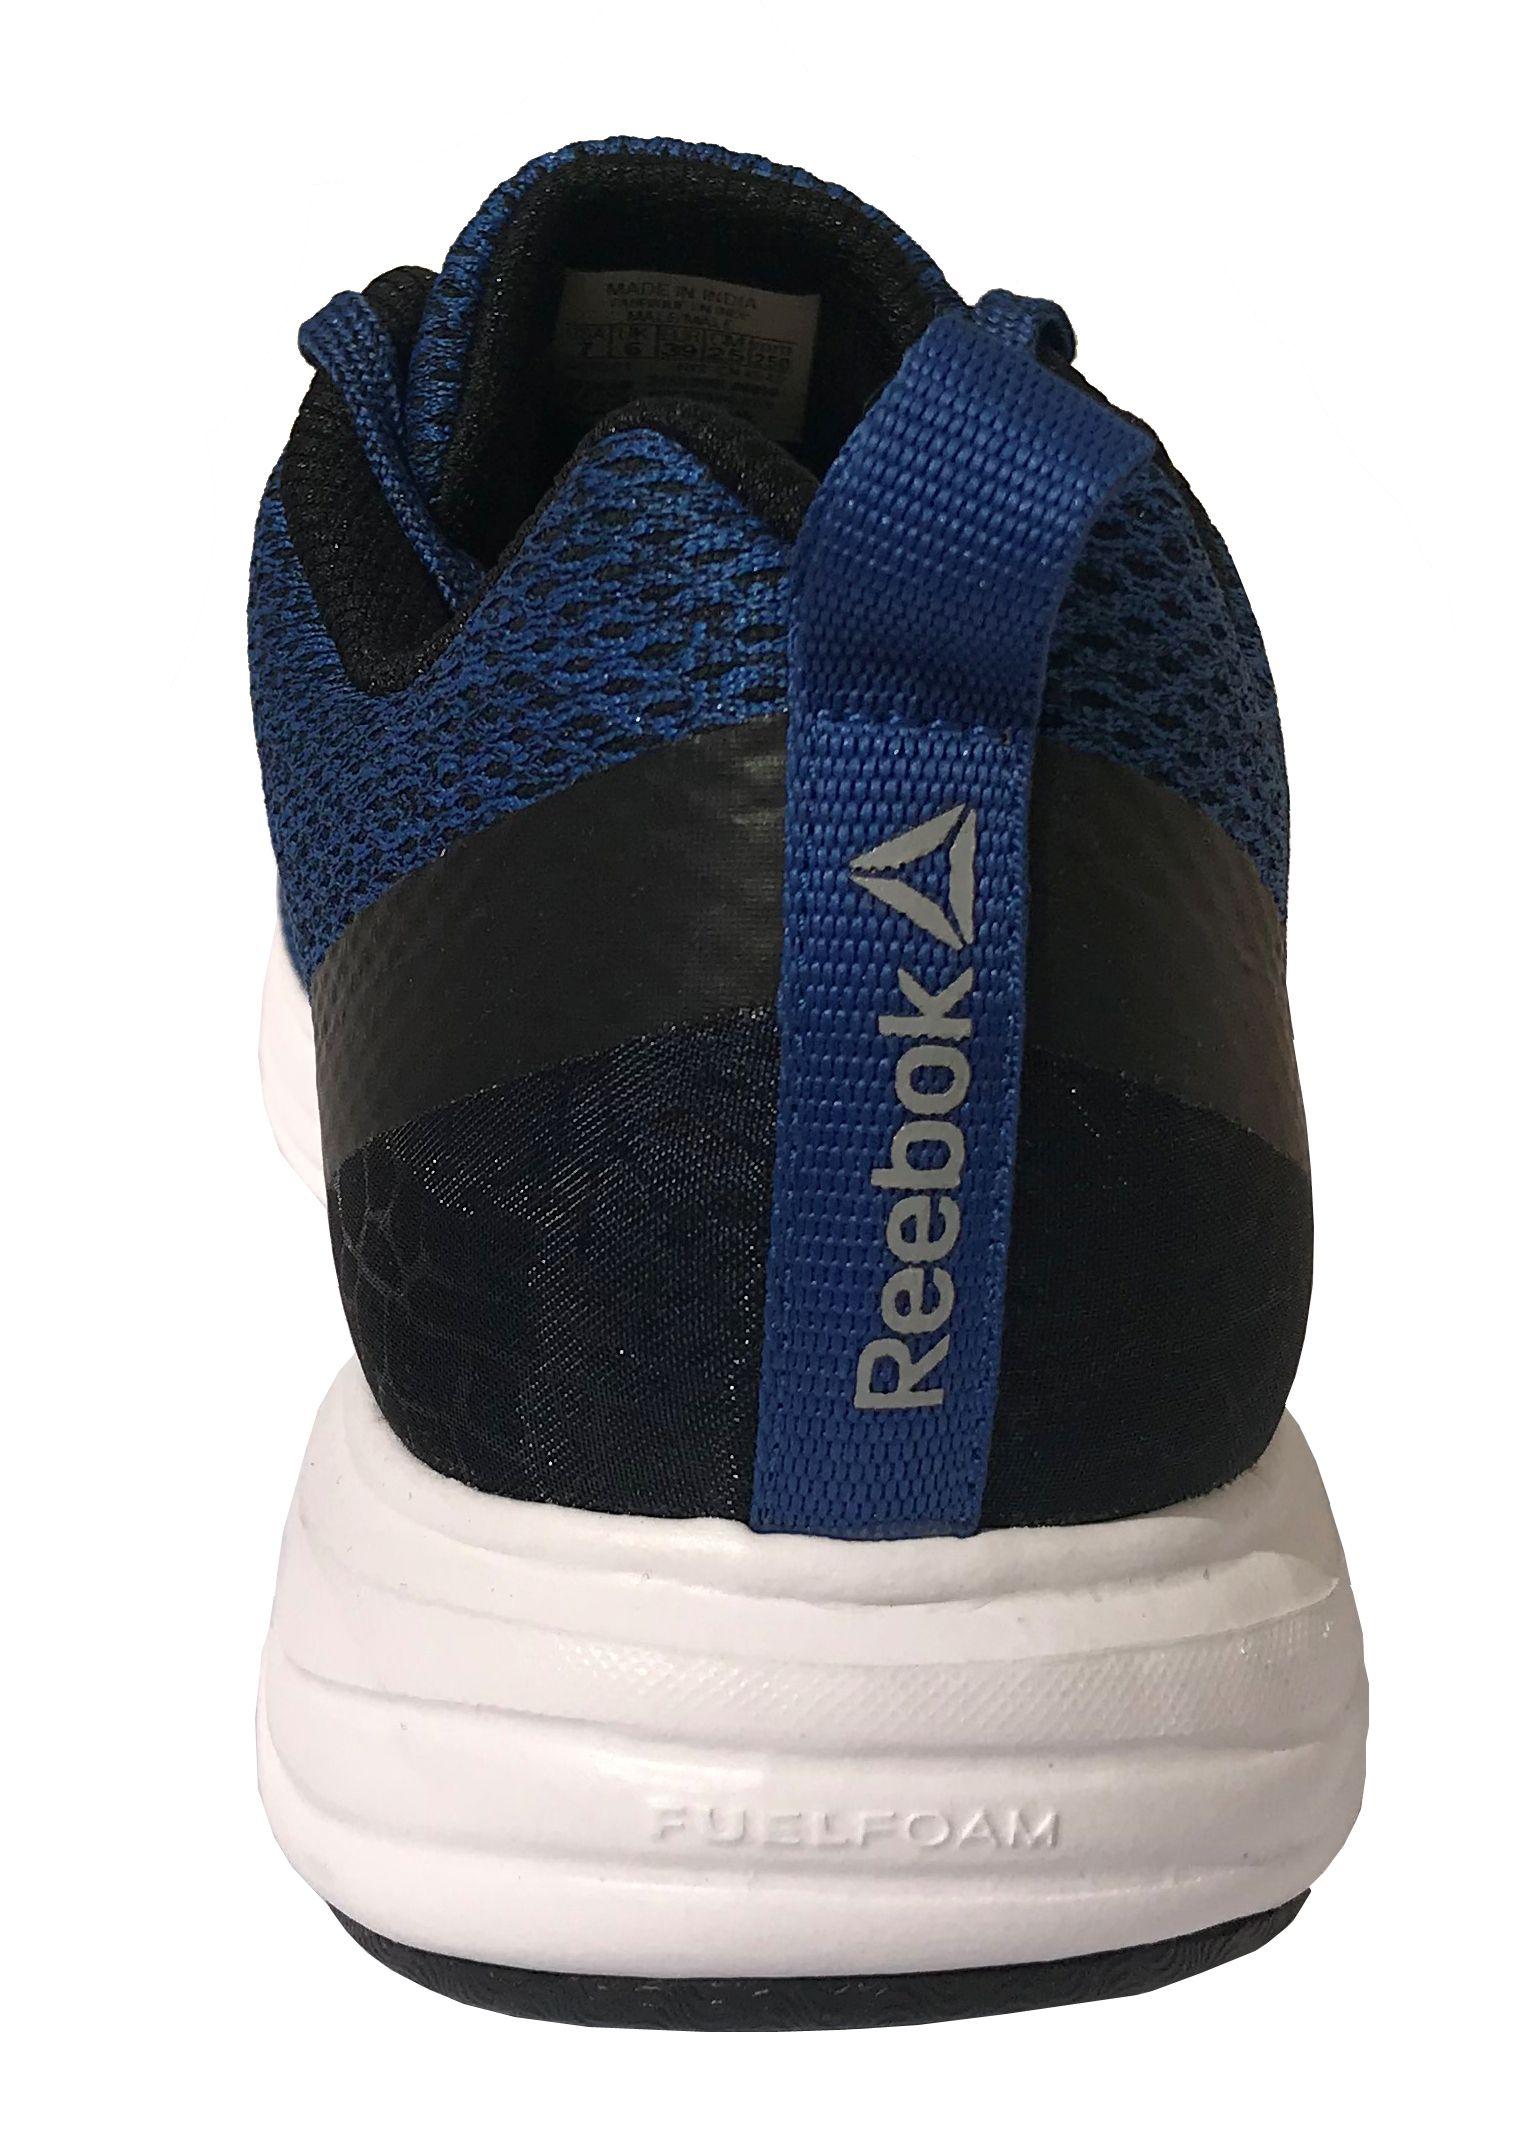 2d10bbc93633 Reebok Zoom Runner Men s Blue Running Shoes - Buy Reebok Zoom Runner ...